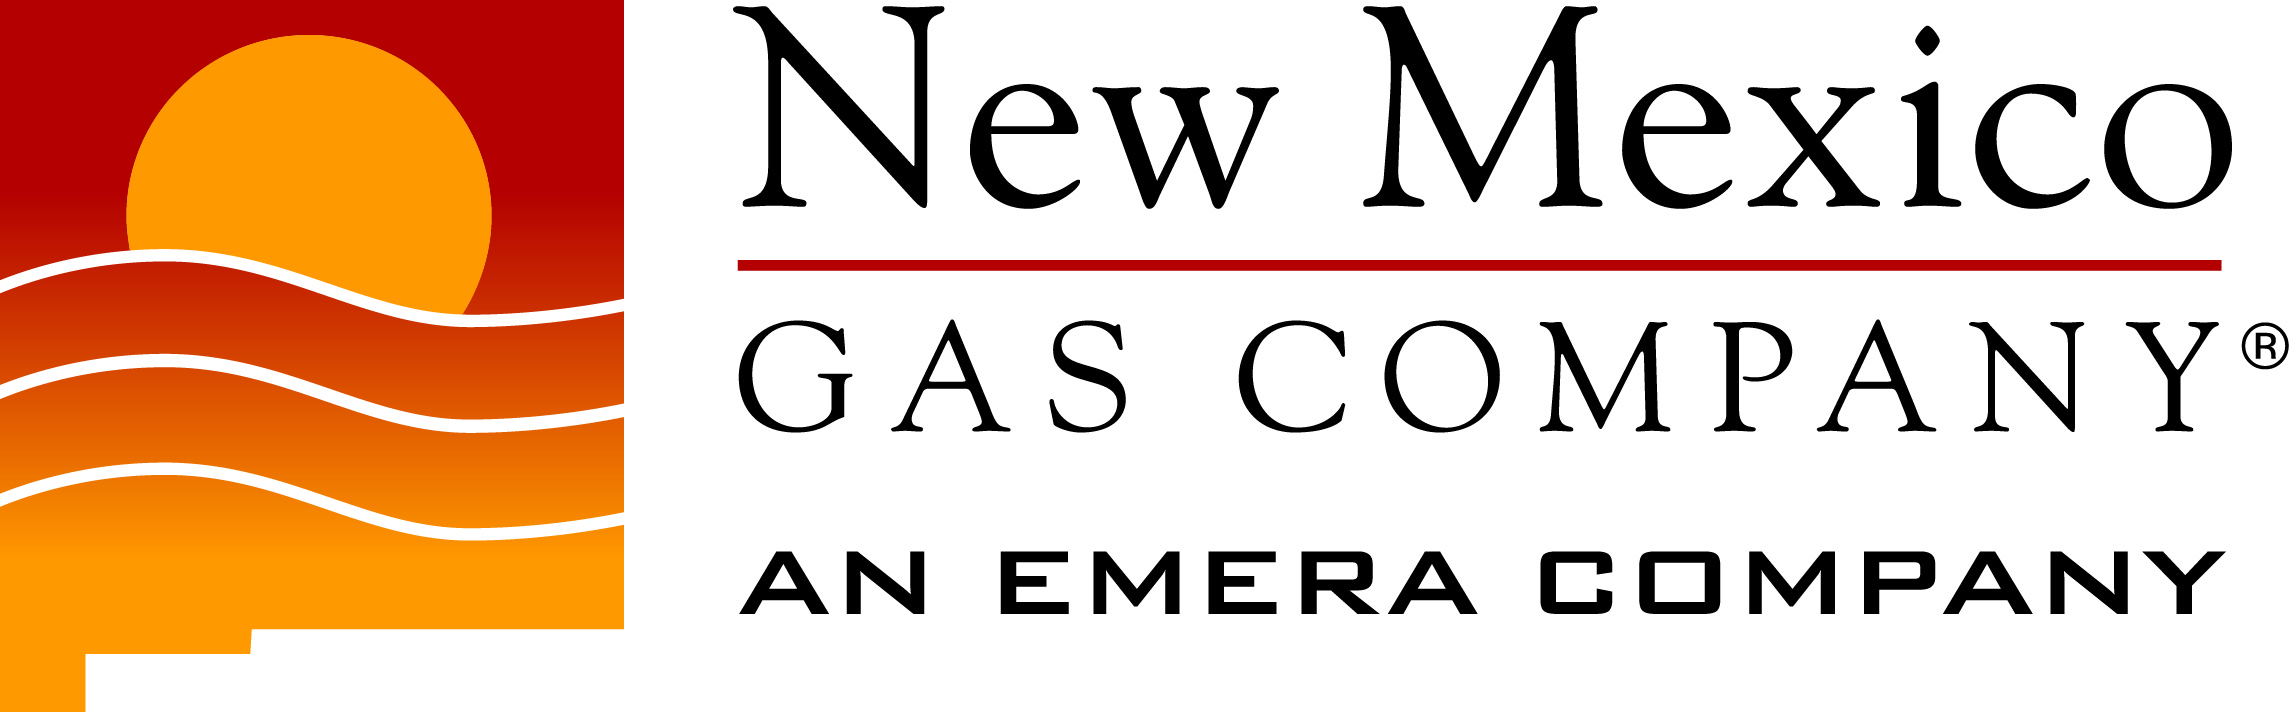 Thank you, NM Gas Company!